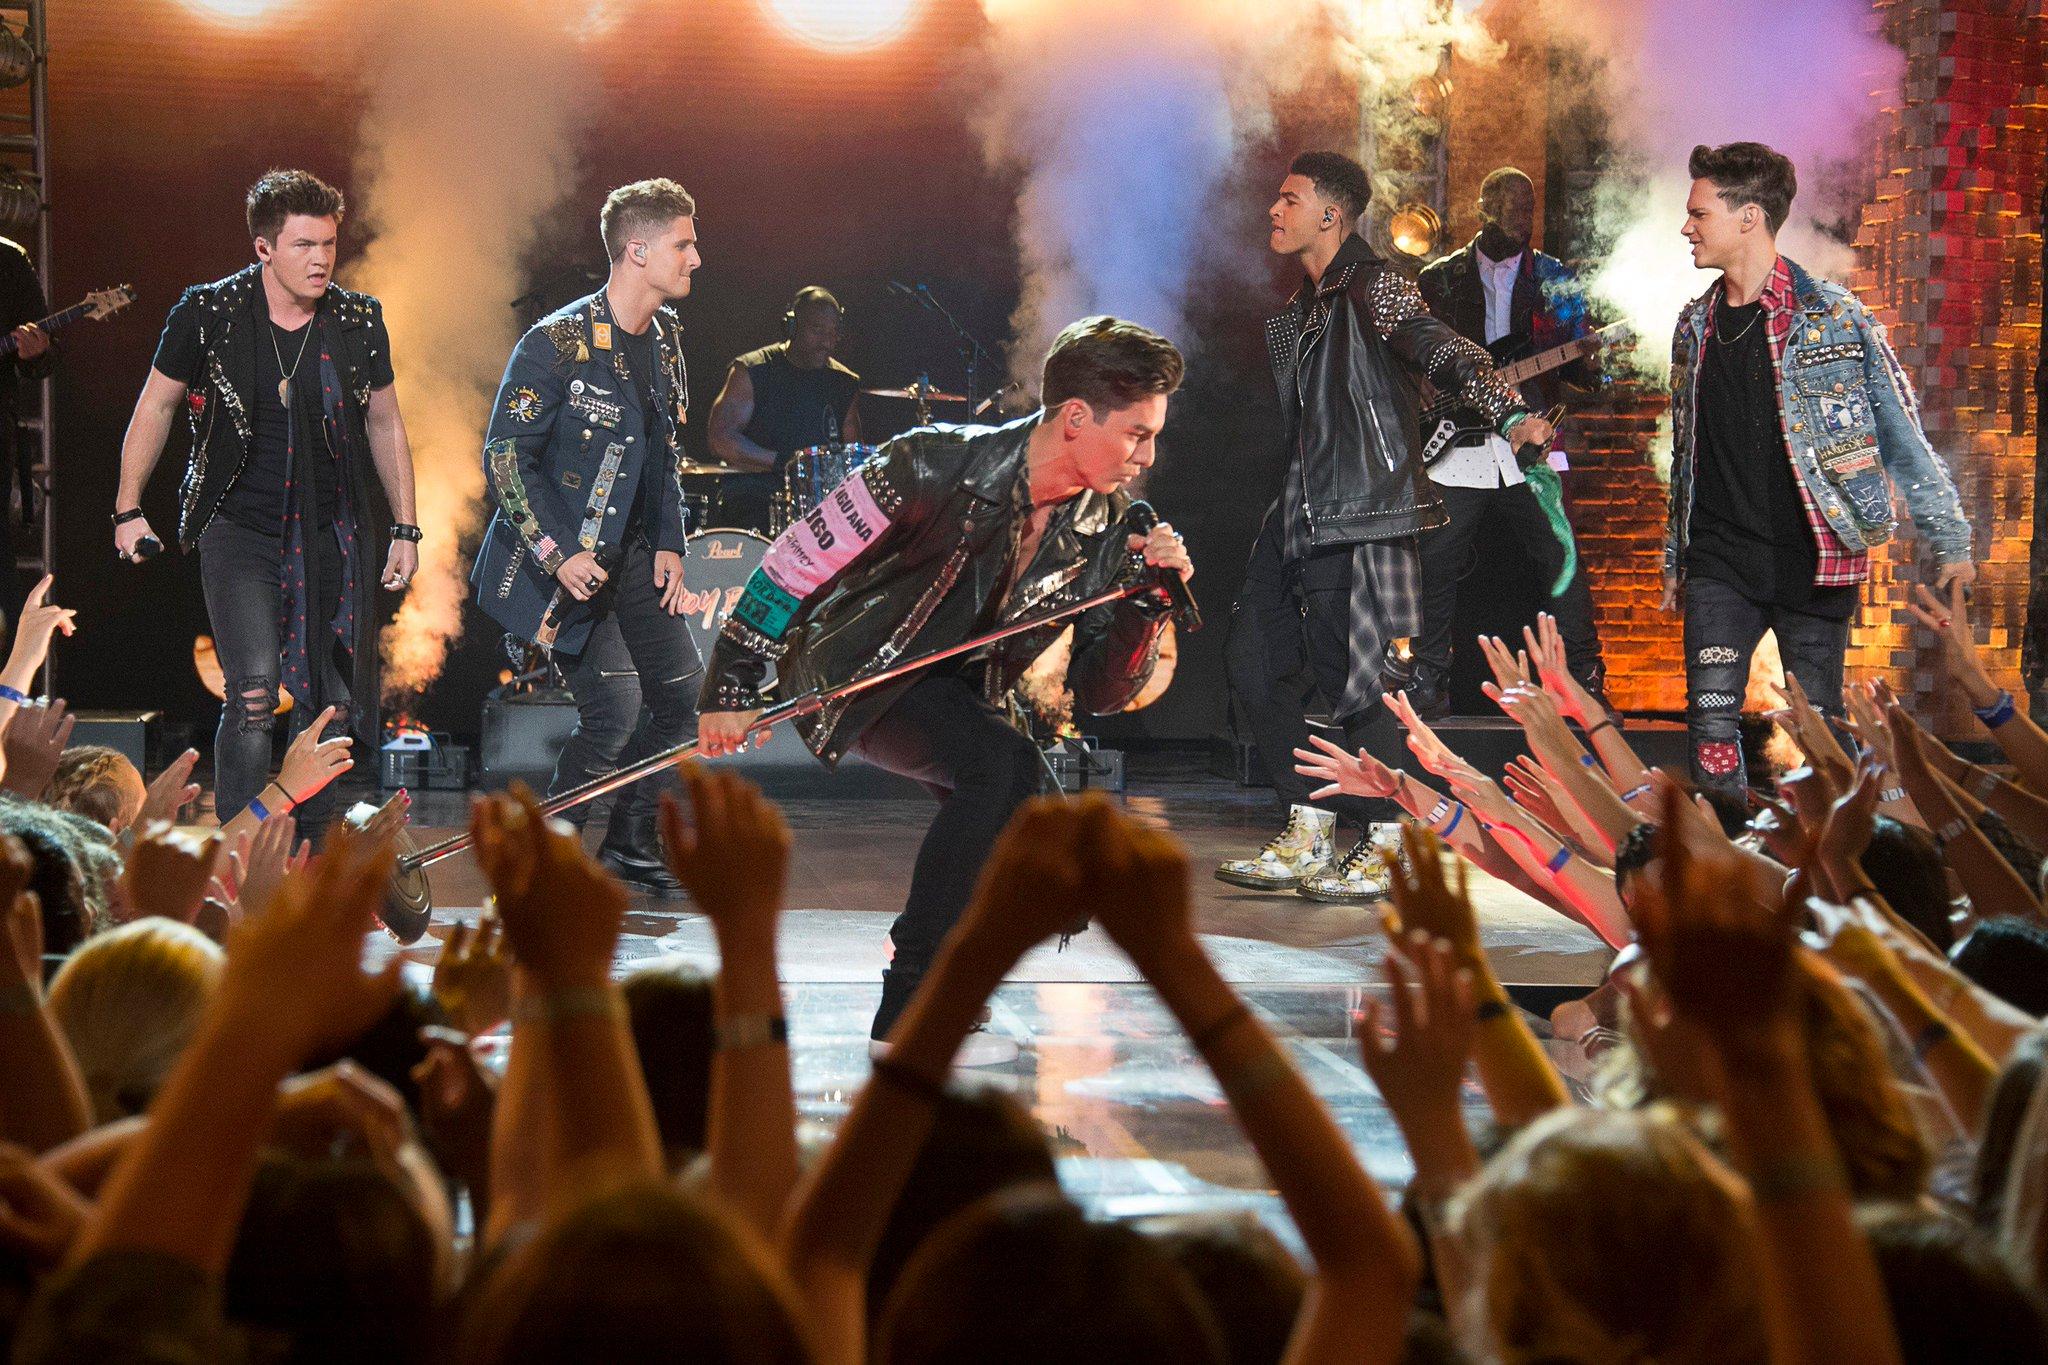 "RT @BoyBandABC: Whoooah! Timeless channels their inner Bon Jovi with ""Livin' on a Prayer!"" #BoyBand https://t.co/dHui4JoaSr"